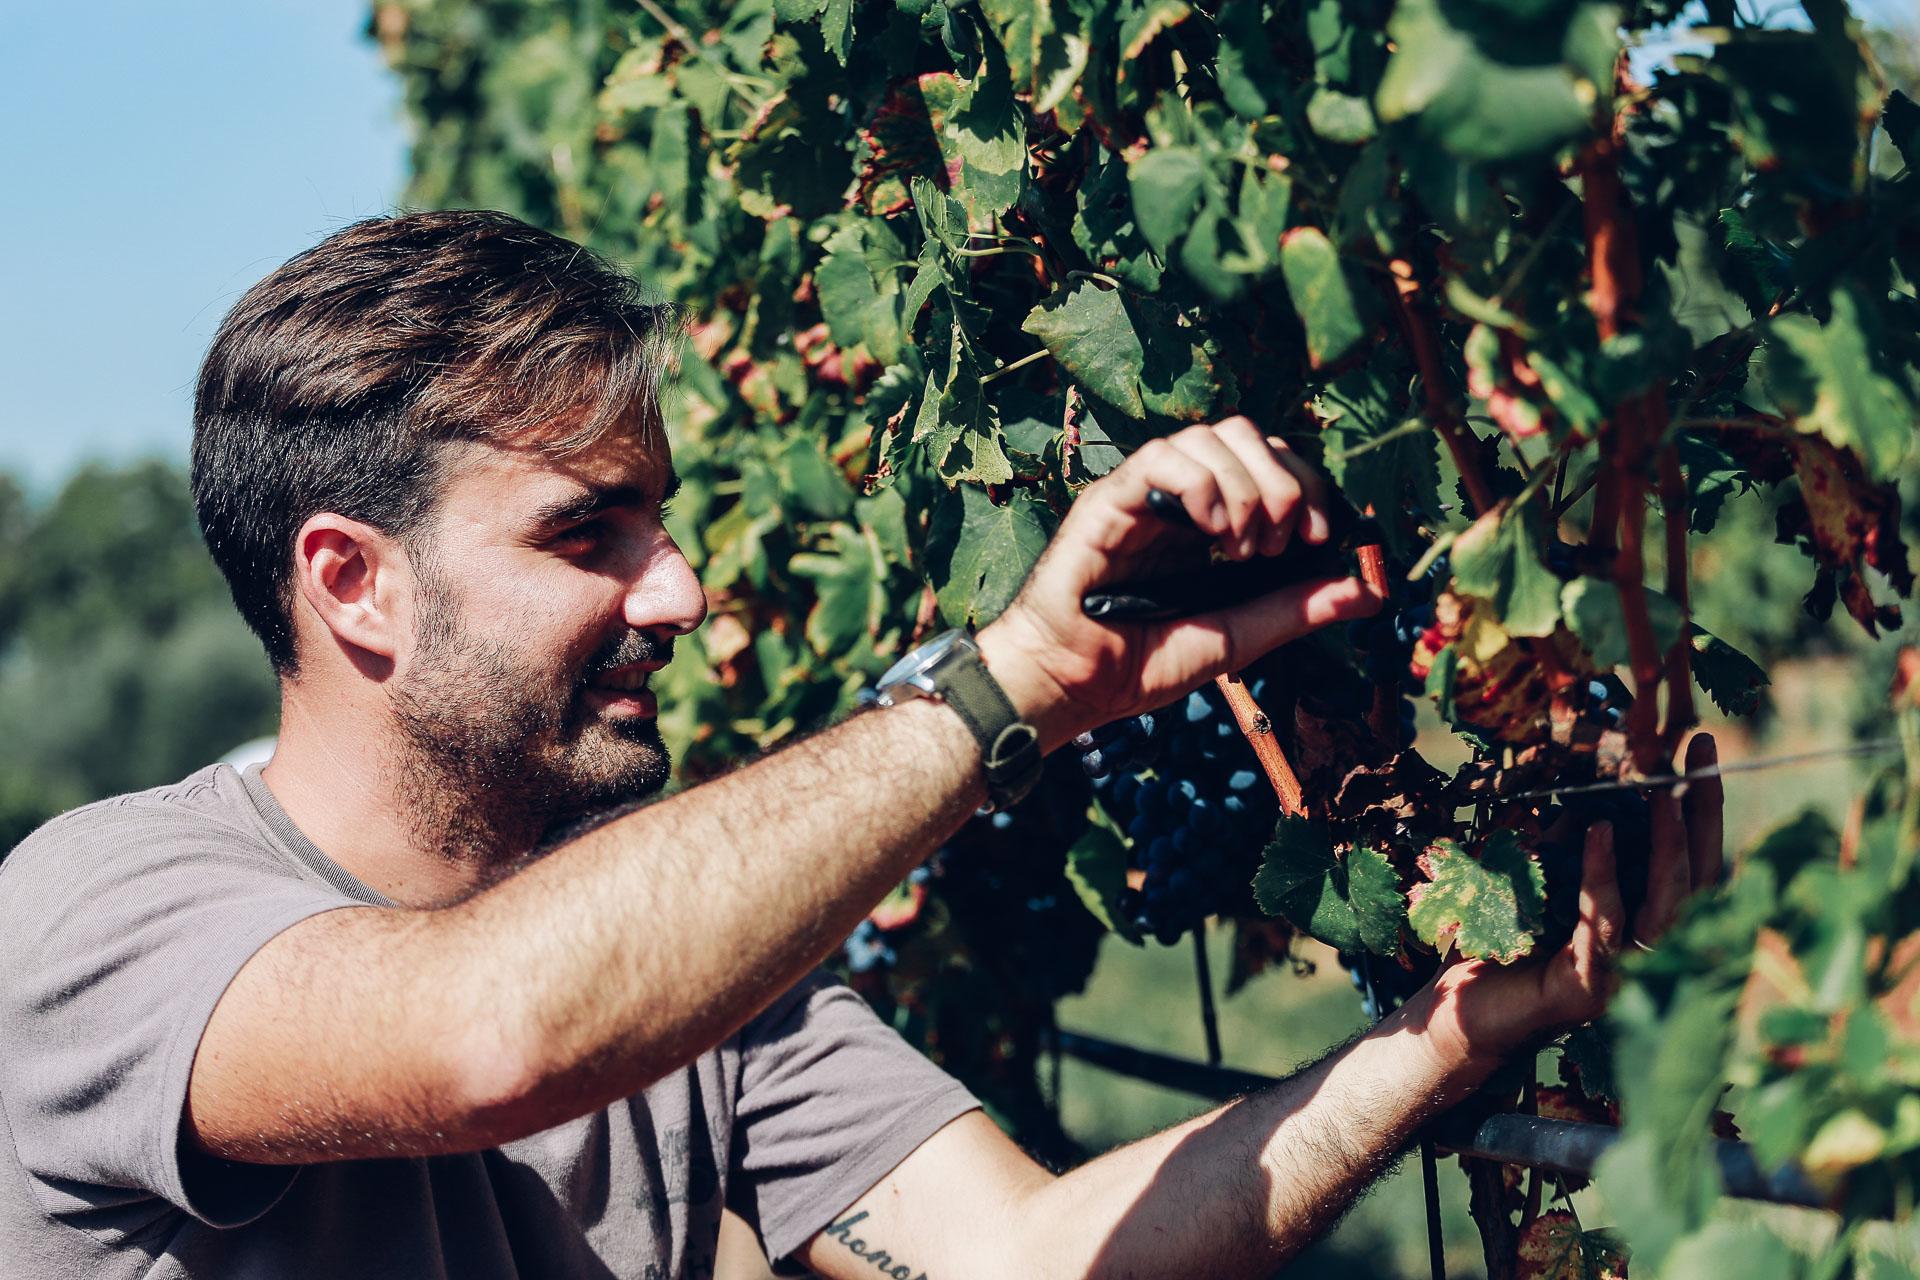 030-Sauro-maule-wineyards-organic-harvest-2016-_RUI7404_p_Lr_web_HD